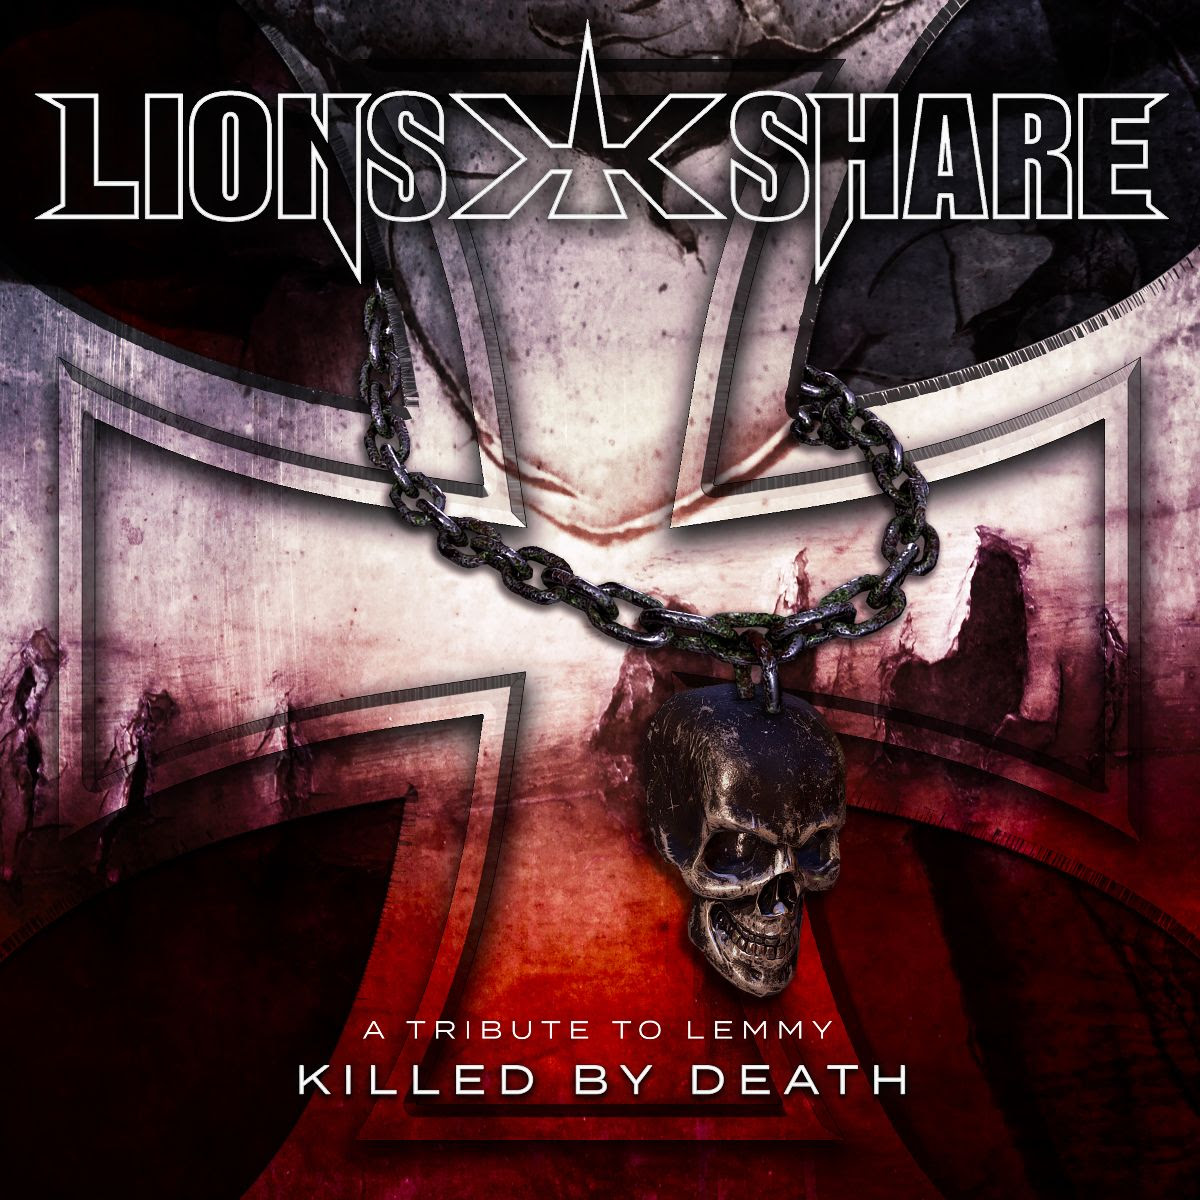 LION'S SHARE estrena cover de MOTÖRHEAD